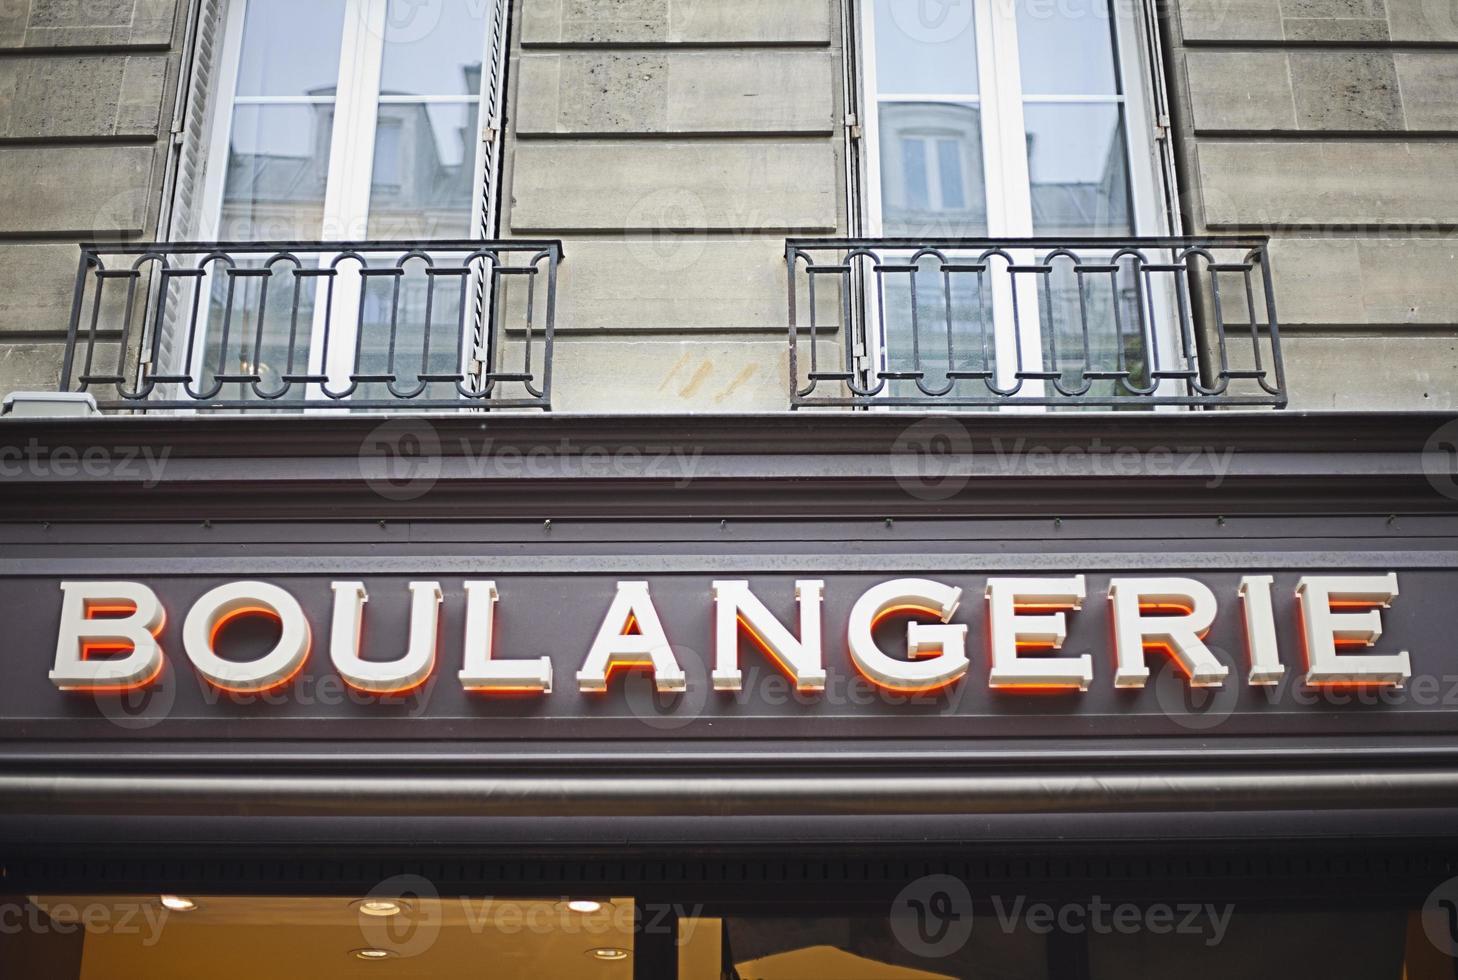 segno boulangerie sulla strada francese foto